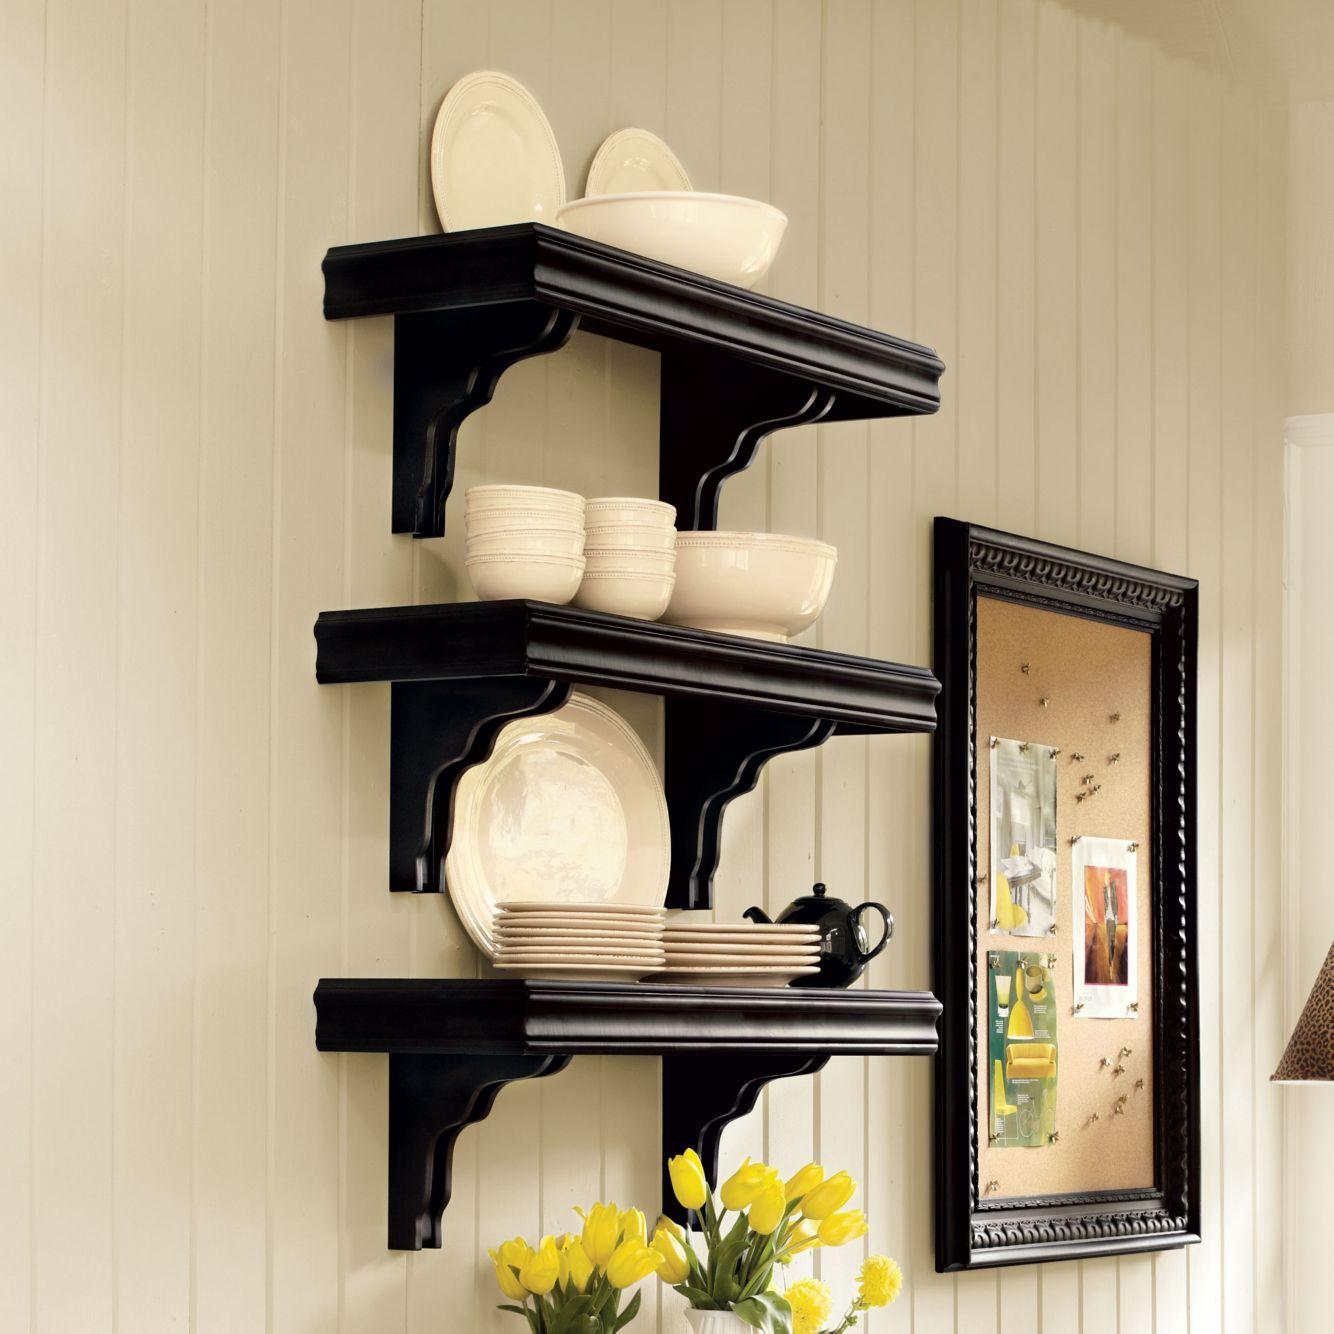 Cafe Shelving 12 Inch Deep Ballard Designs Easy Shelves Diy Wooden Shelves Shelves